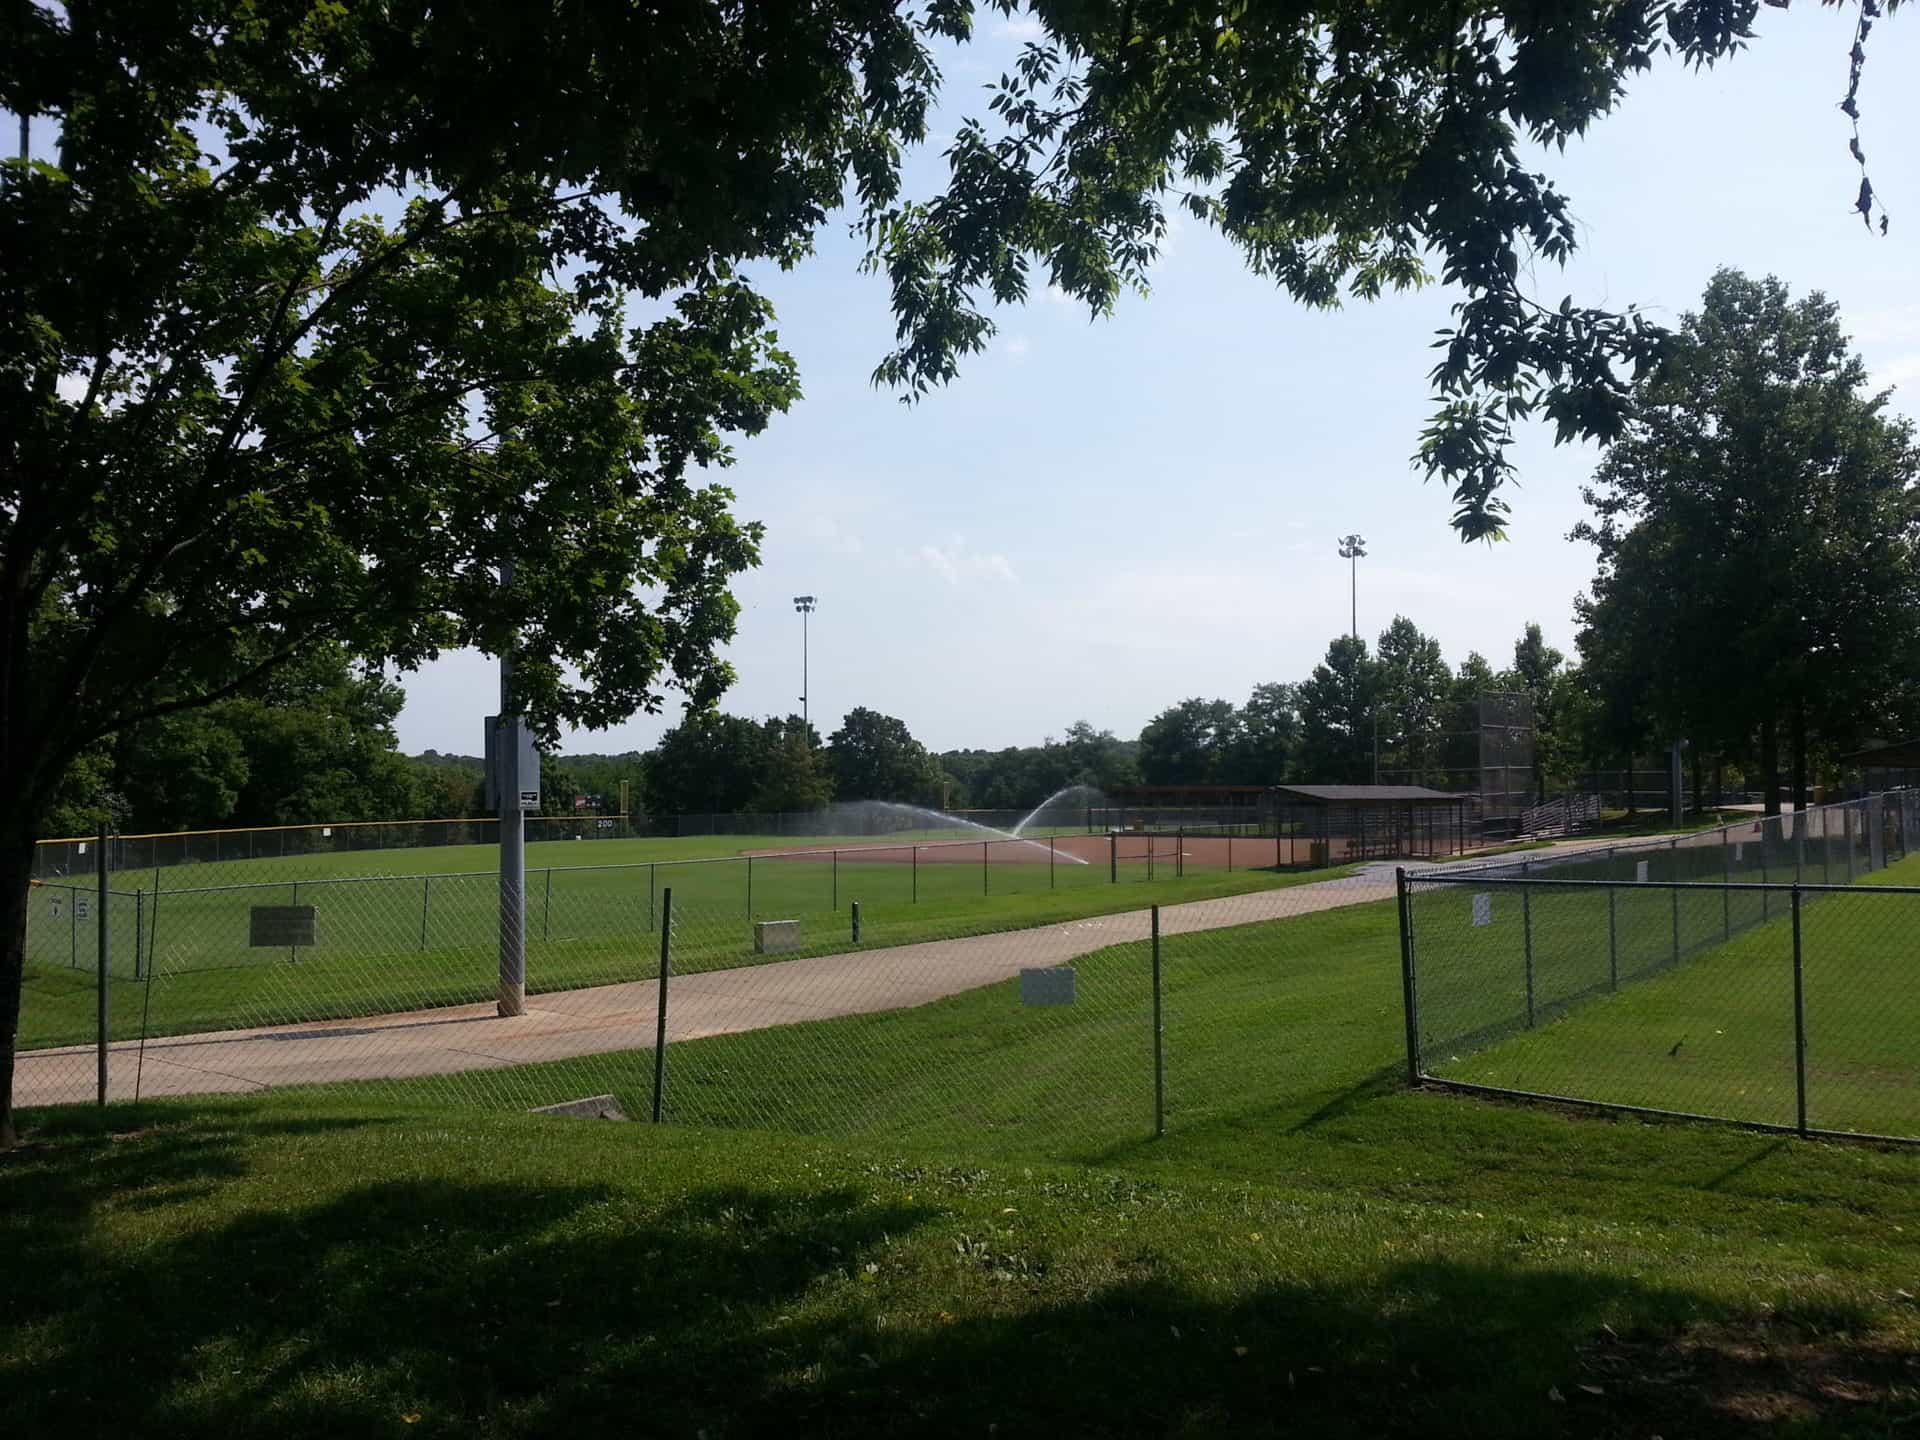 Crockett Park sports fields